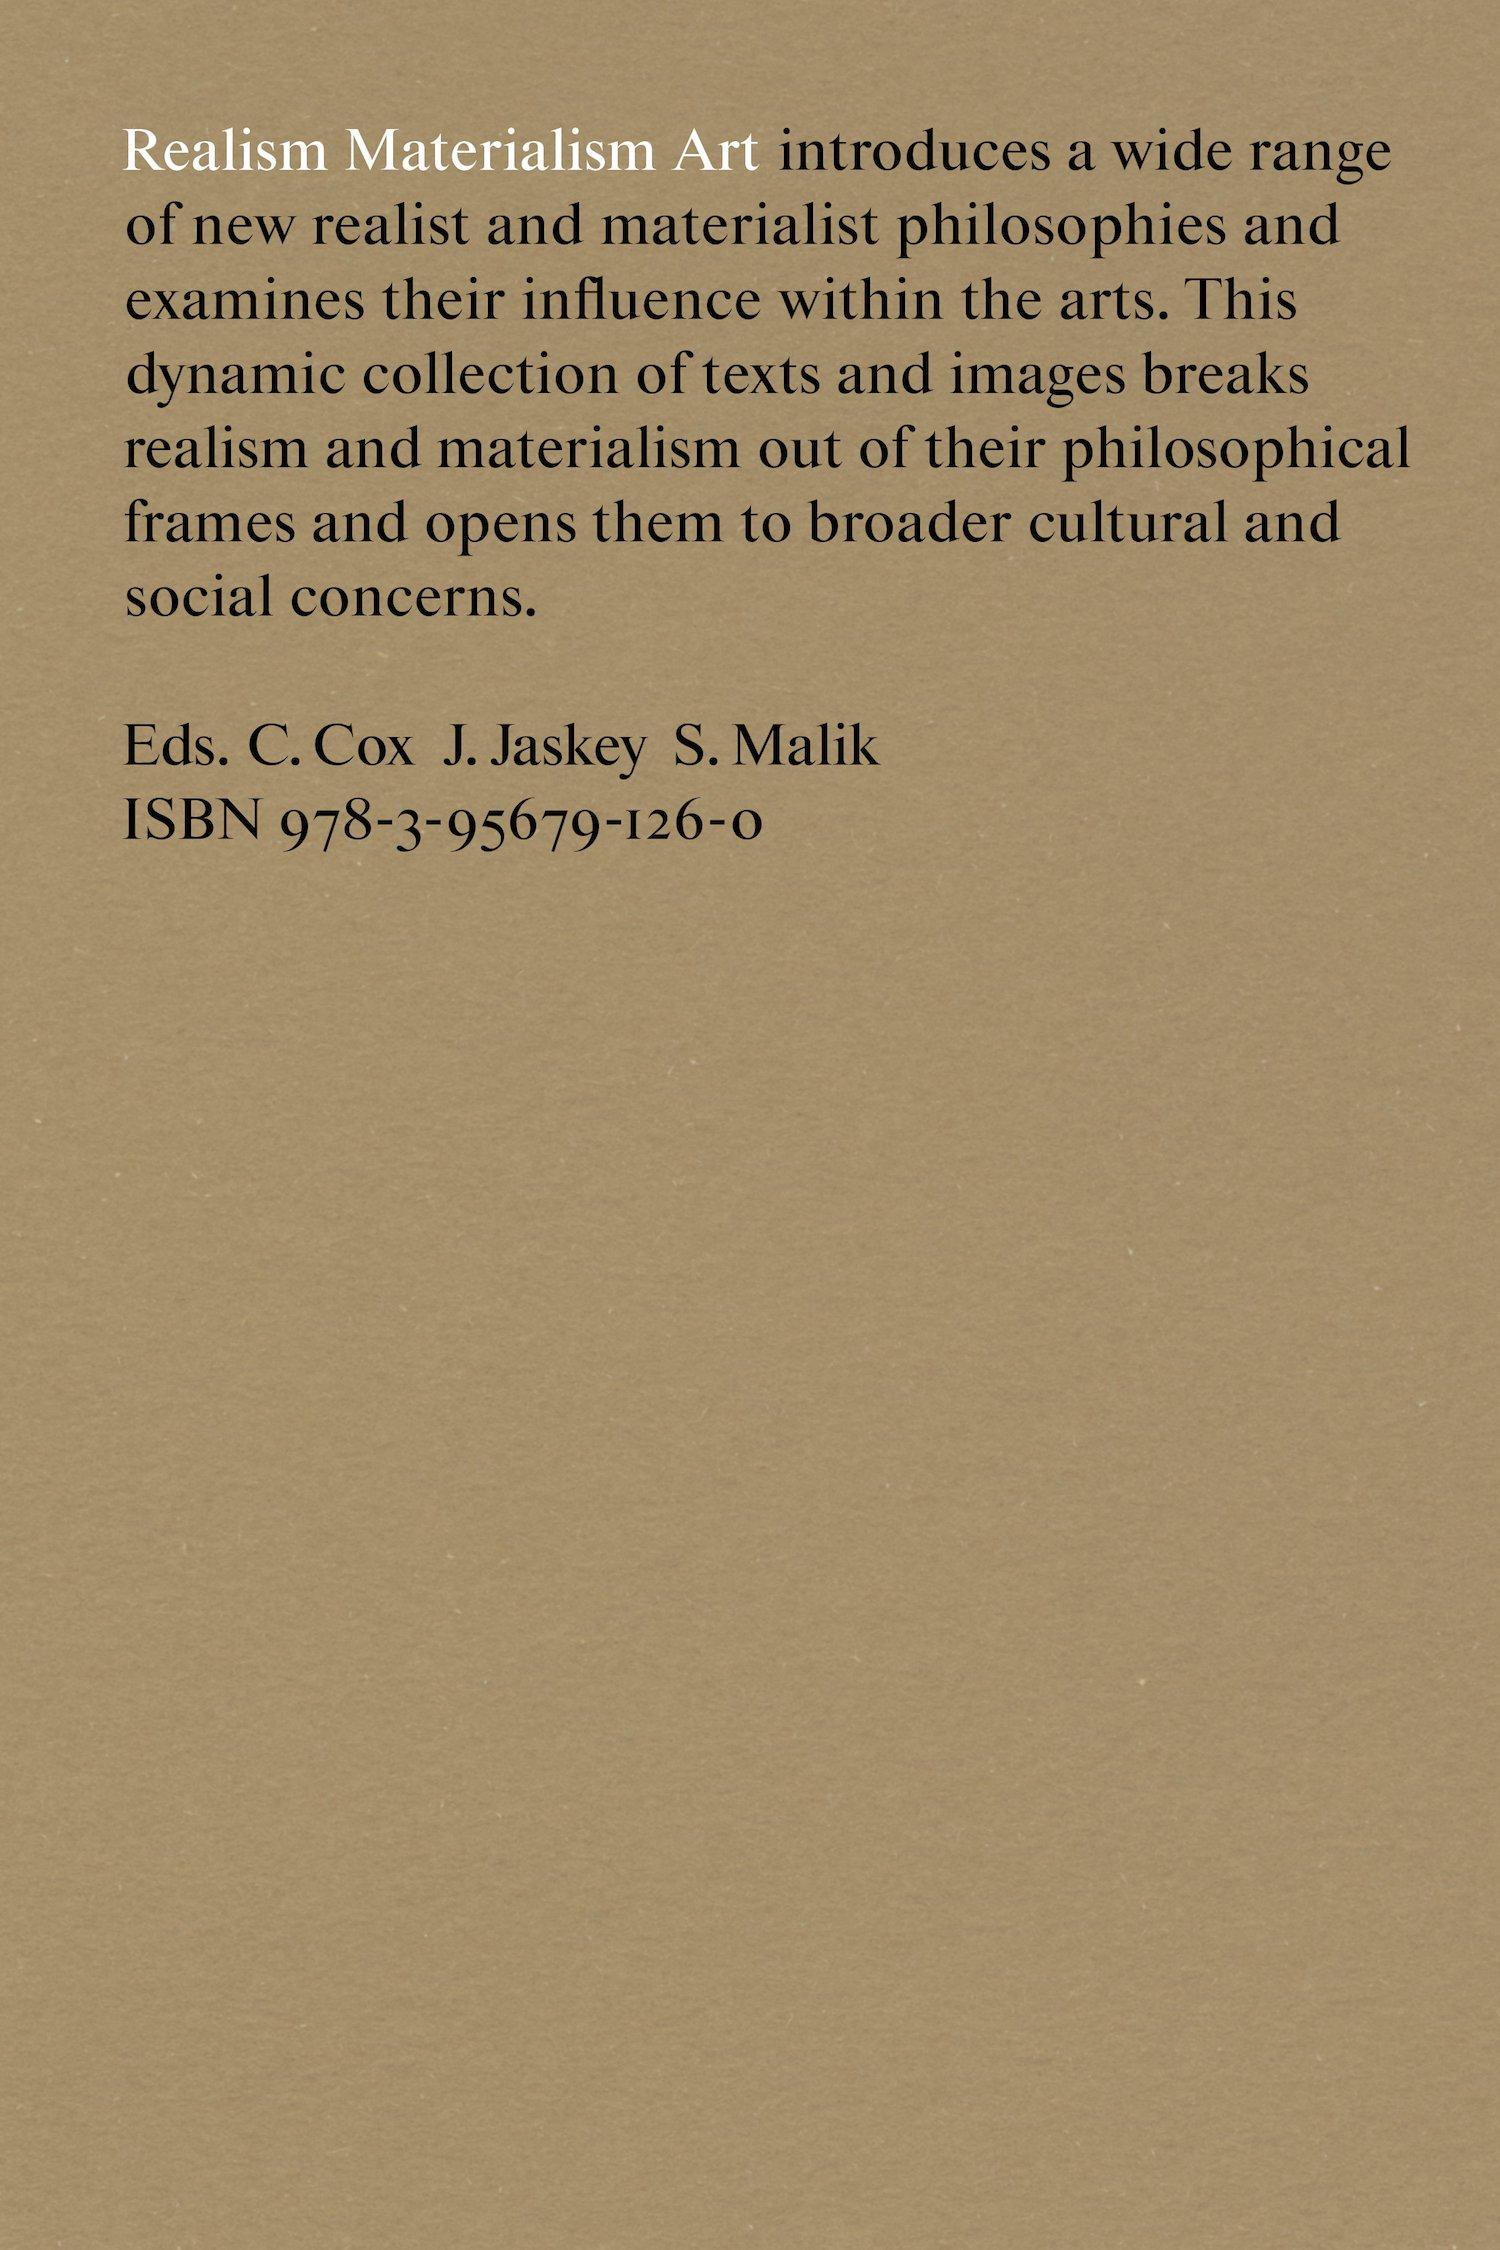 Realism Materialism Art ebook